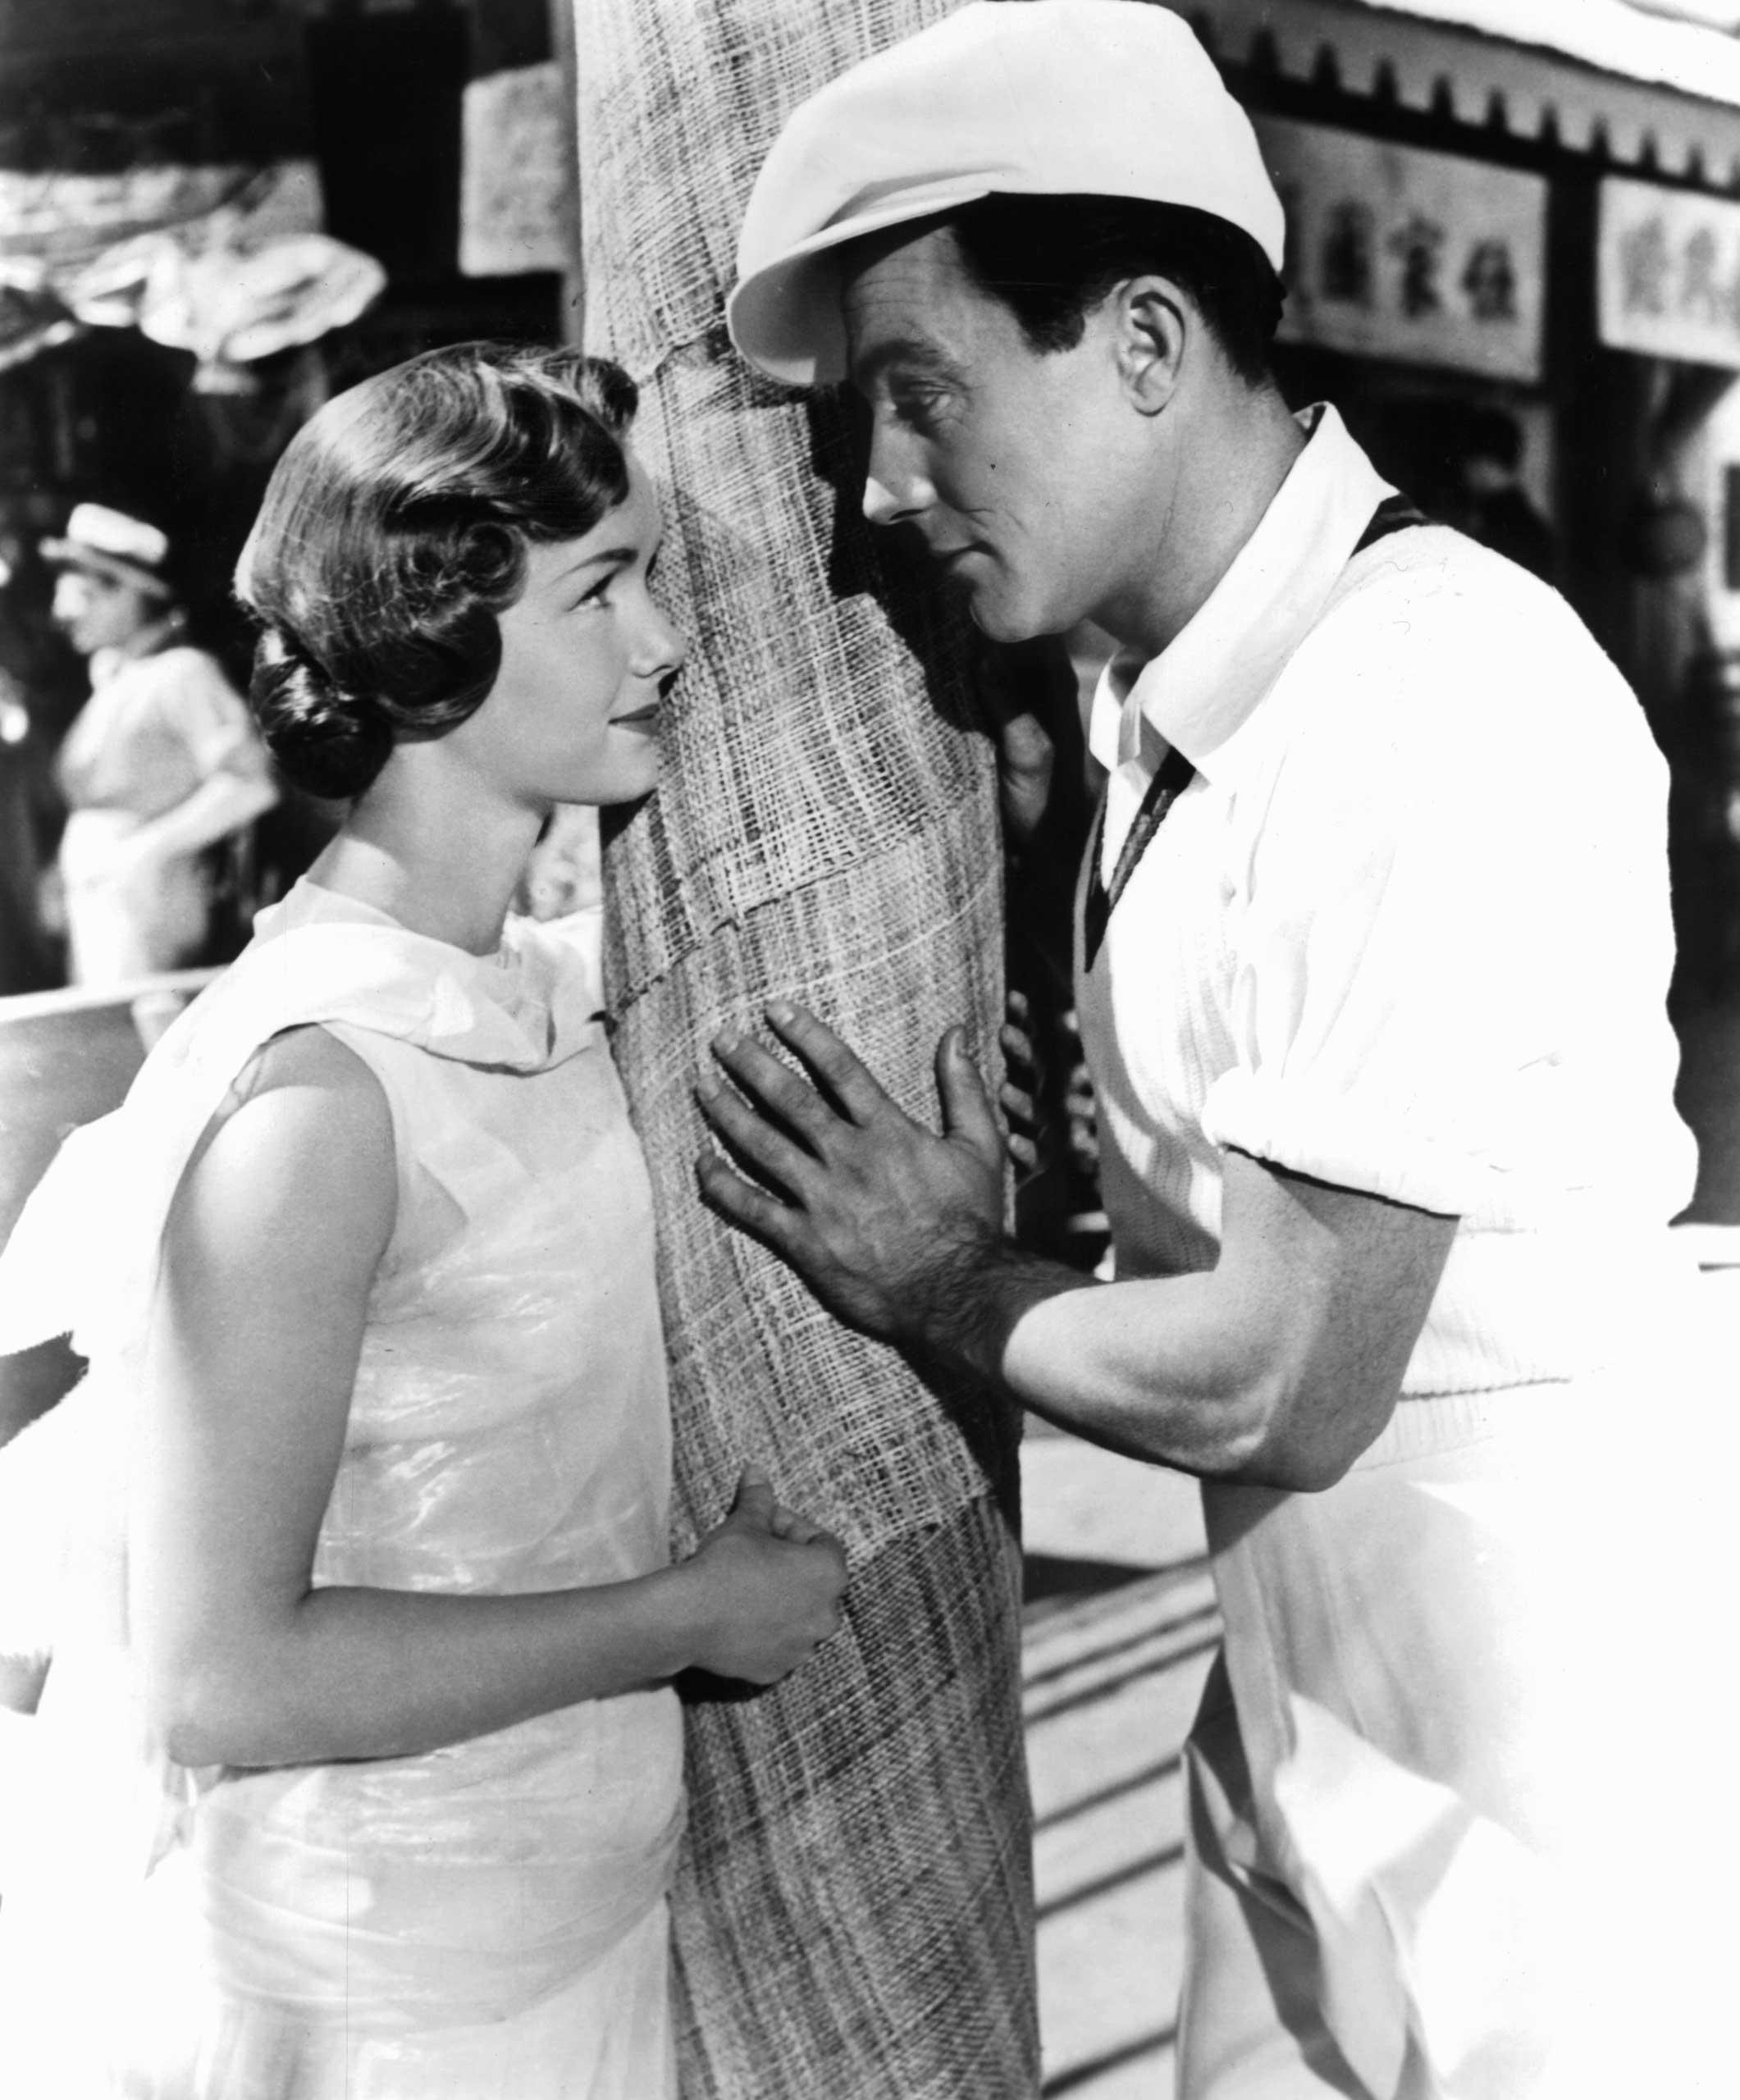 Don Lockwood and Kathy Seldon- Singin' in the Rain, 1952